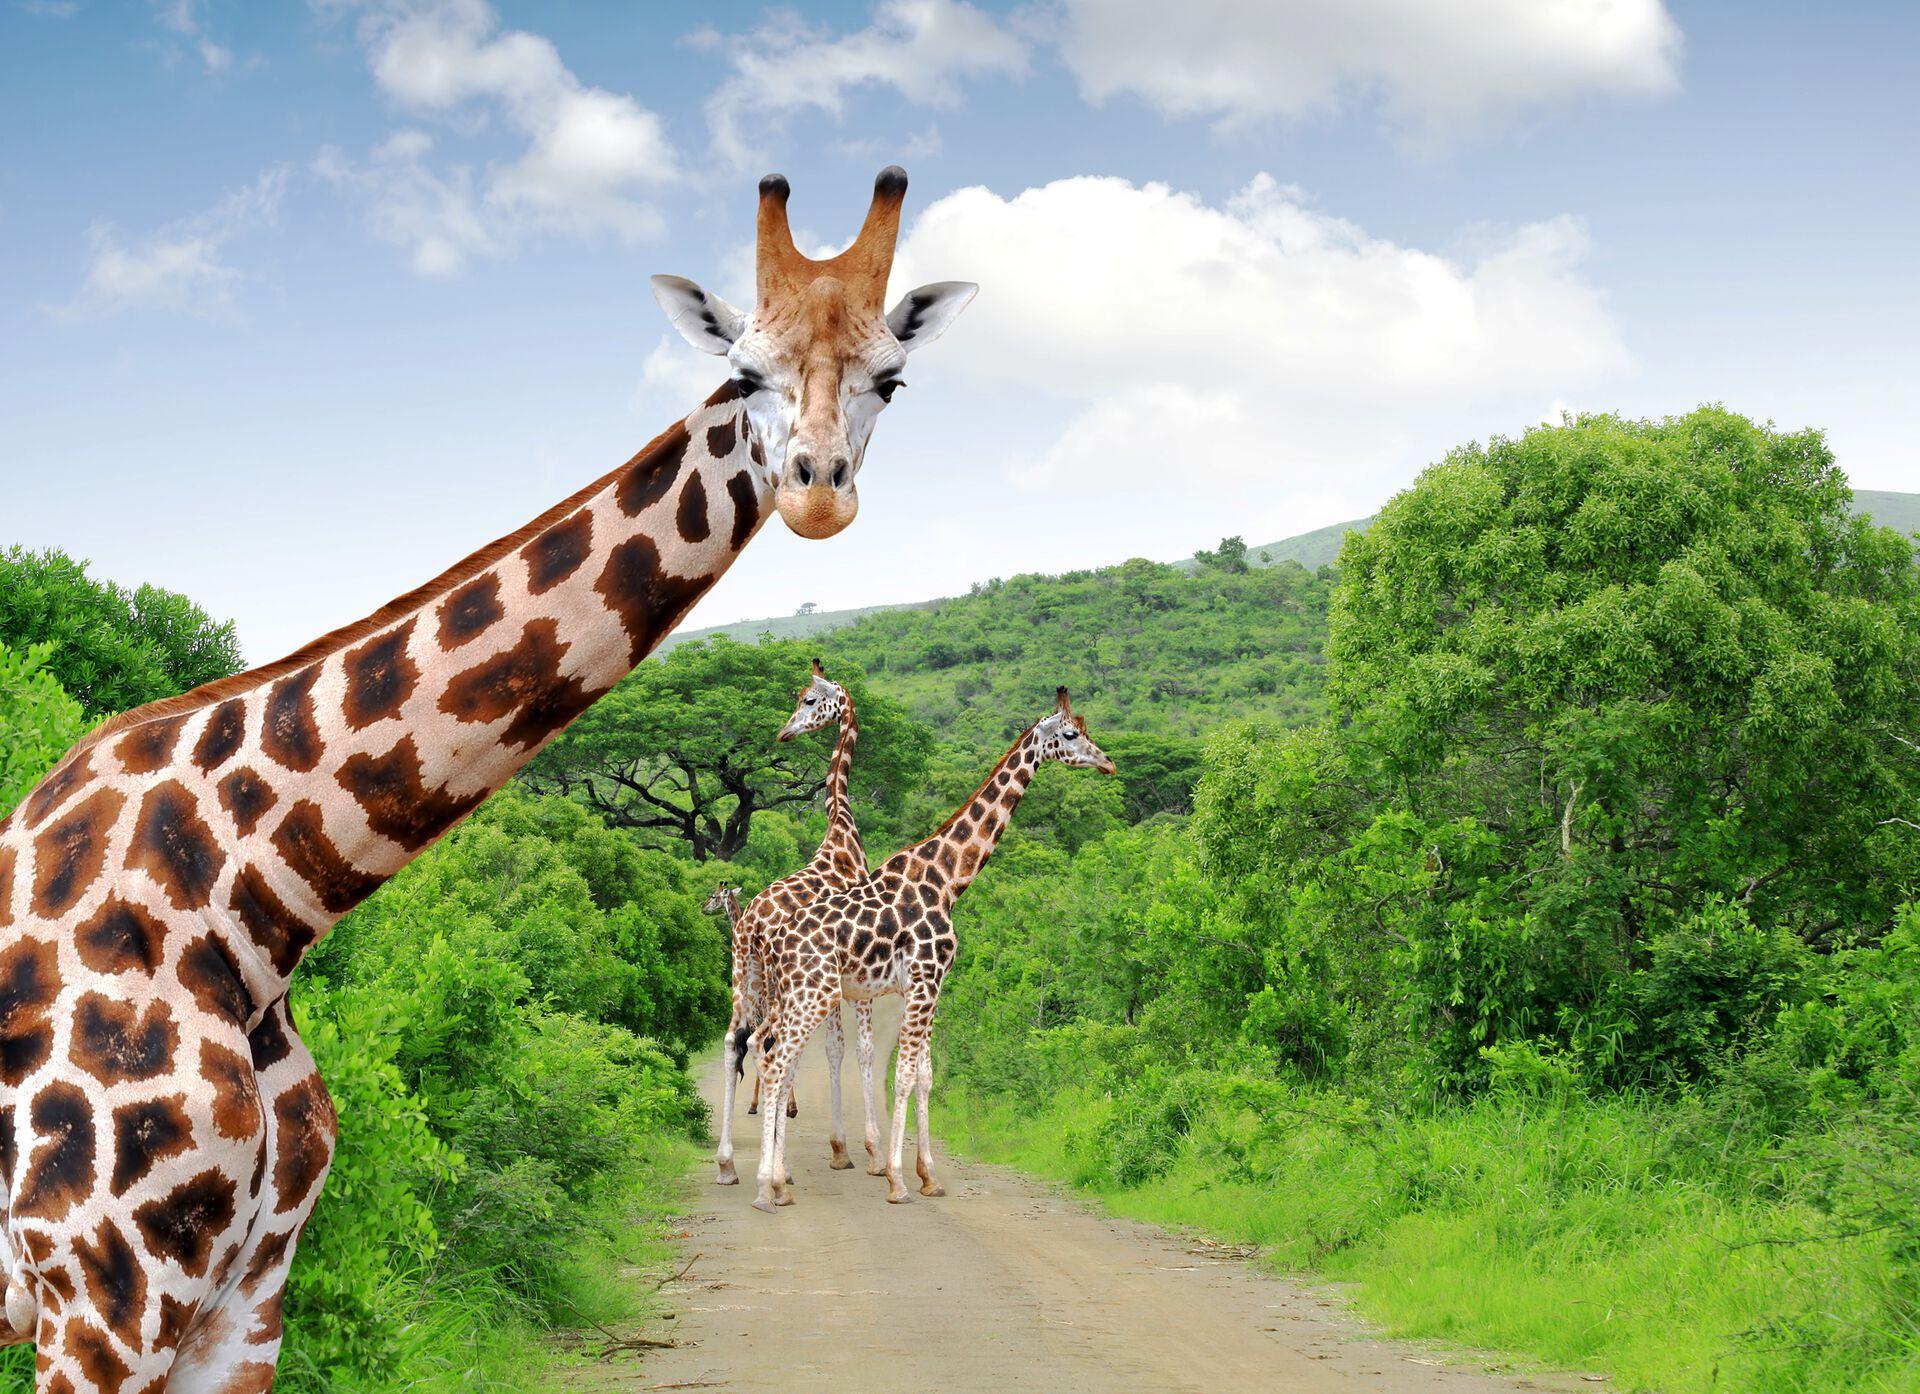 Giraffen im Krüger Nationalpark © vencavolrab